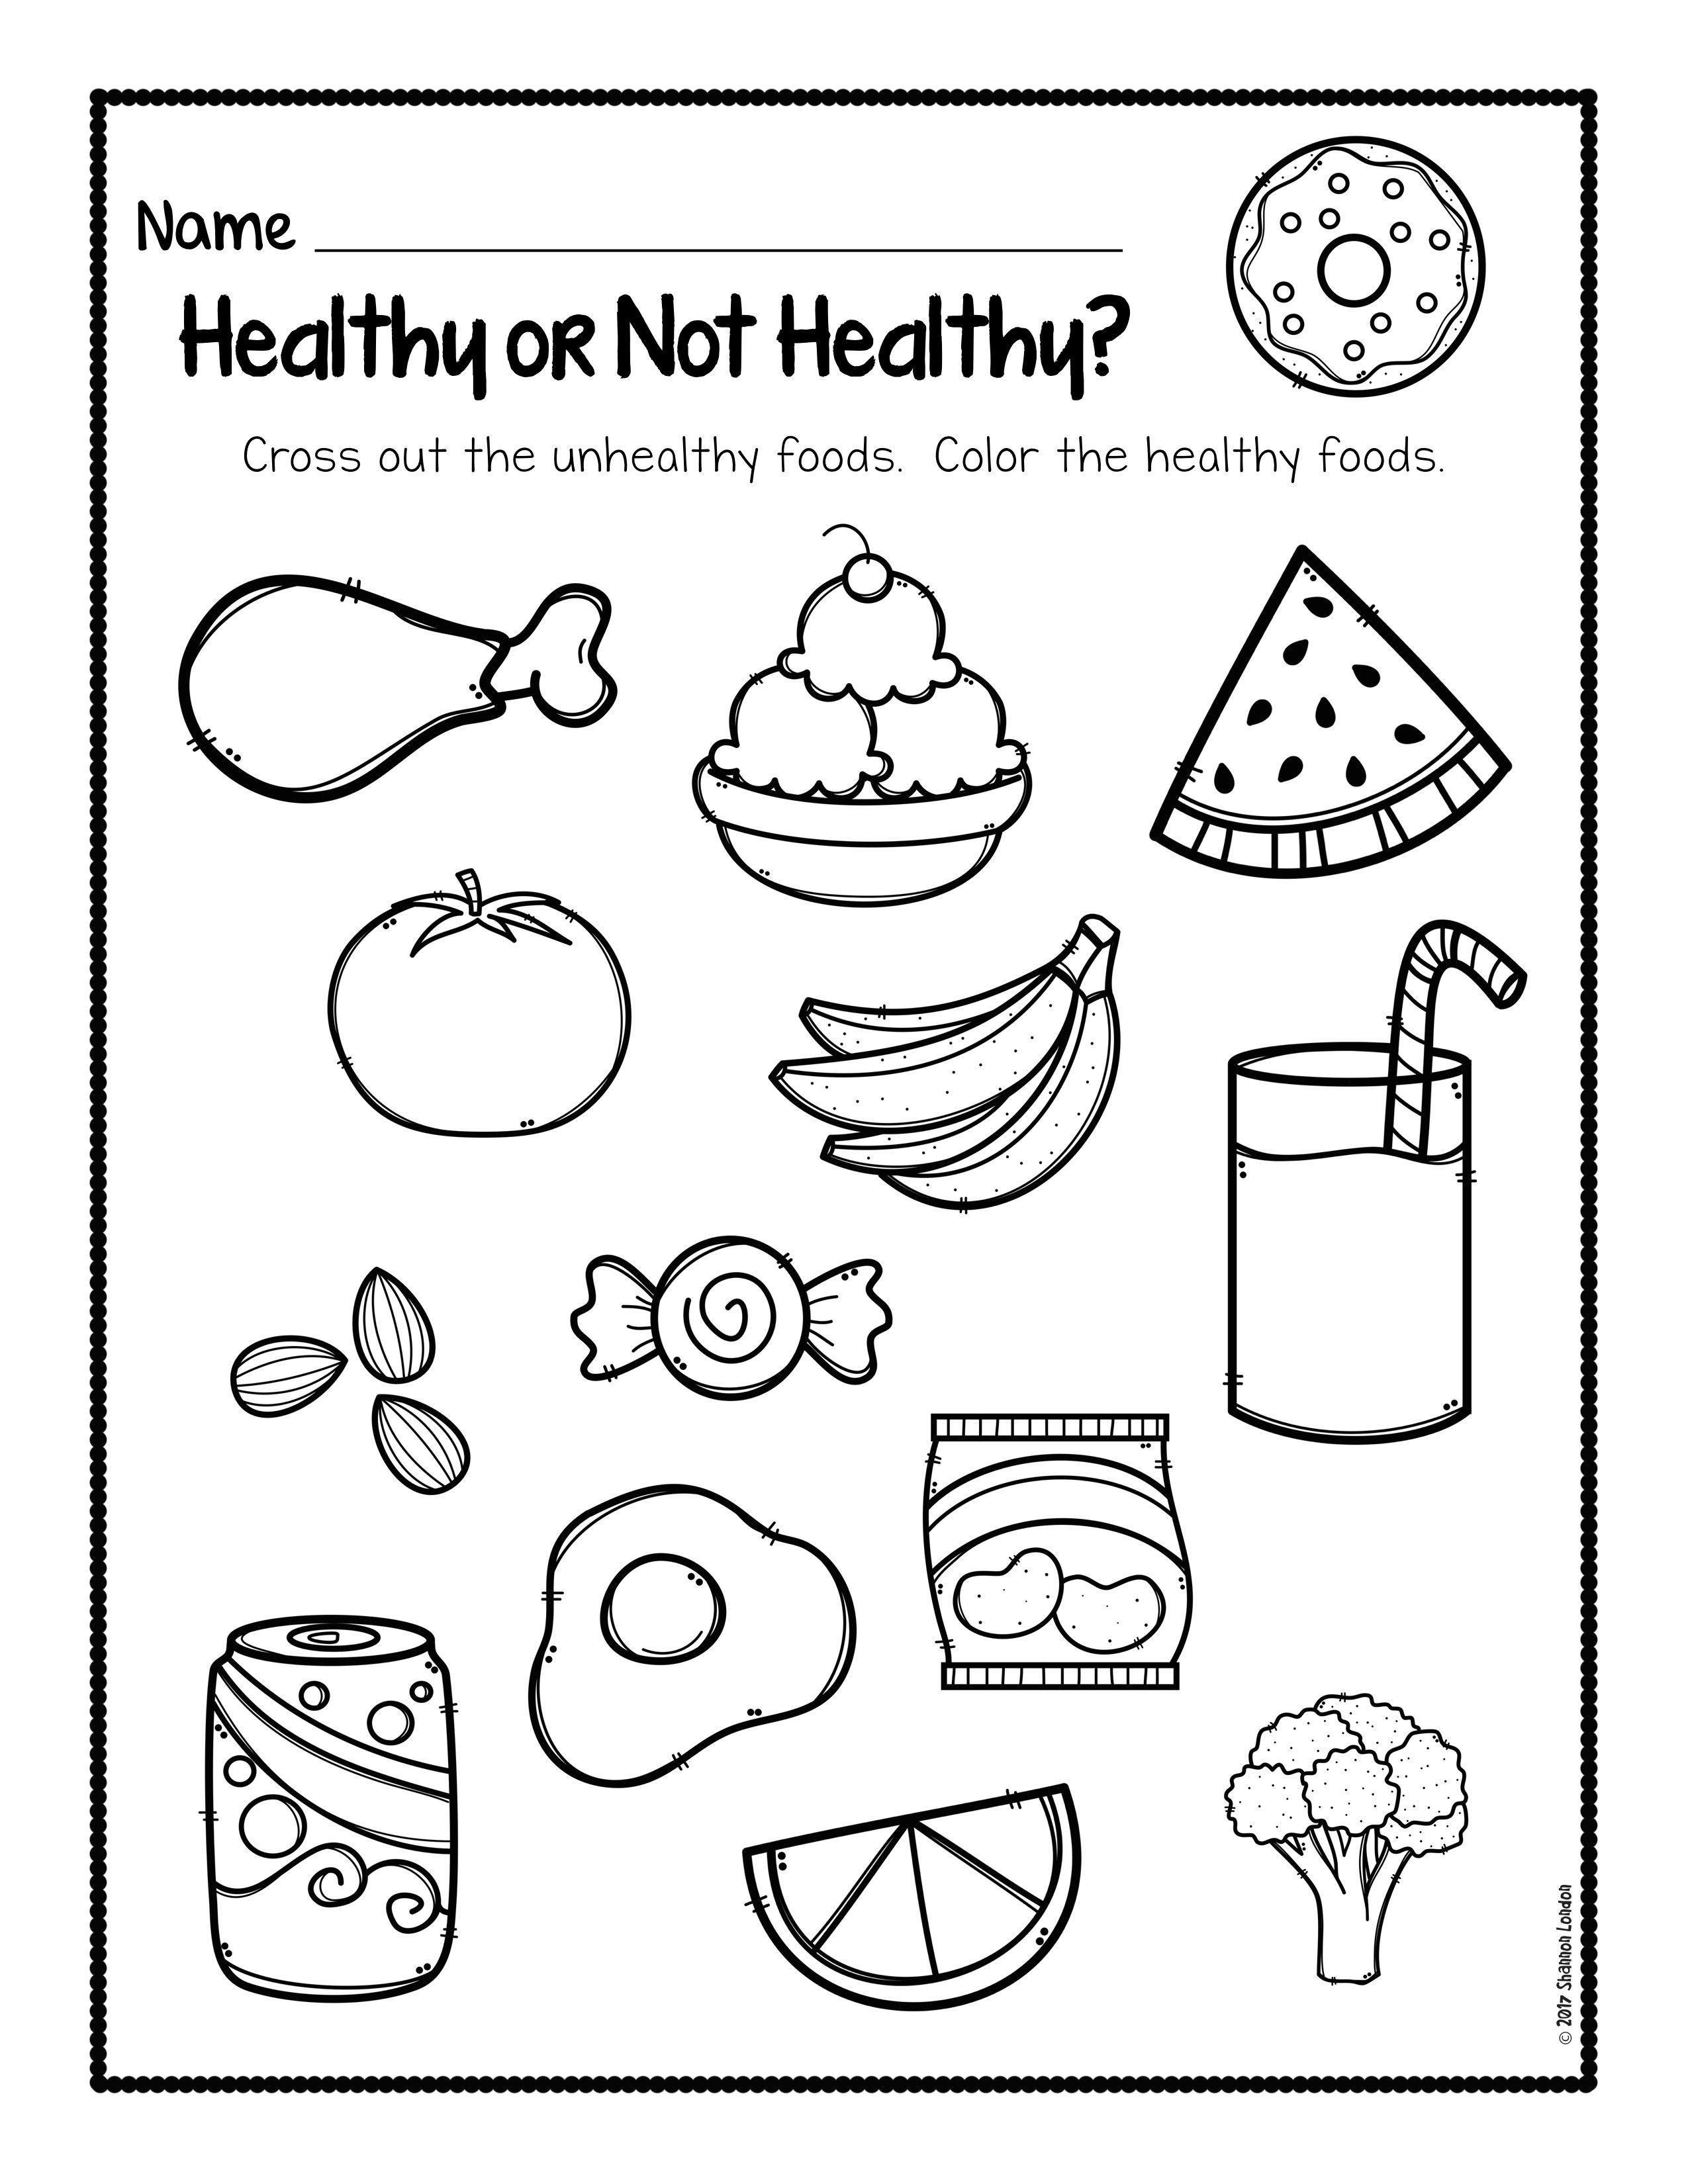 Healthy Foods Worksheet FREE DOWNLOAD   Healthy habits for kids [ 3300 x 2550 Pixel ]